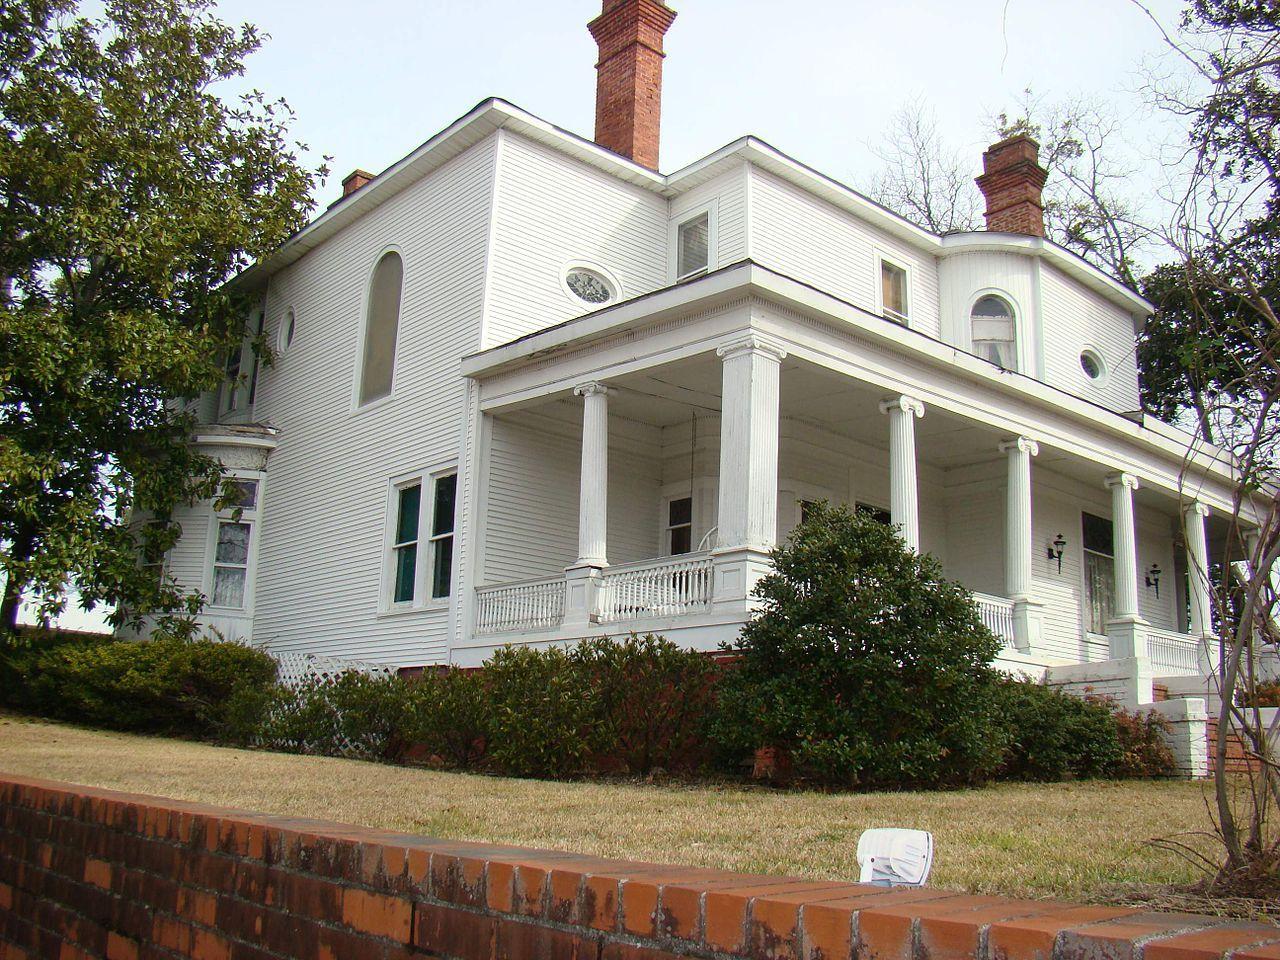 James B. Simmons House in Stephens County, Georgia.